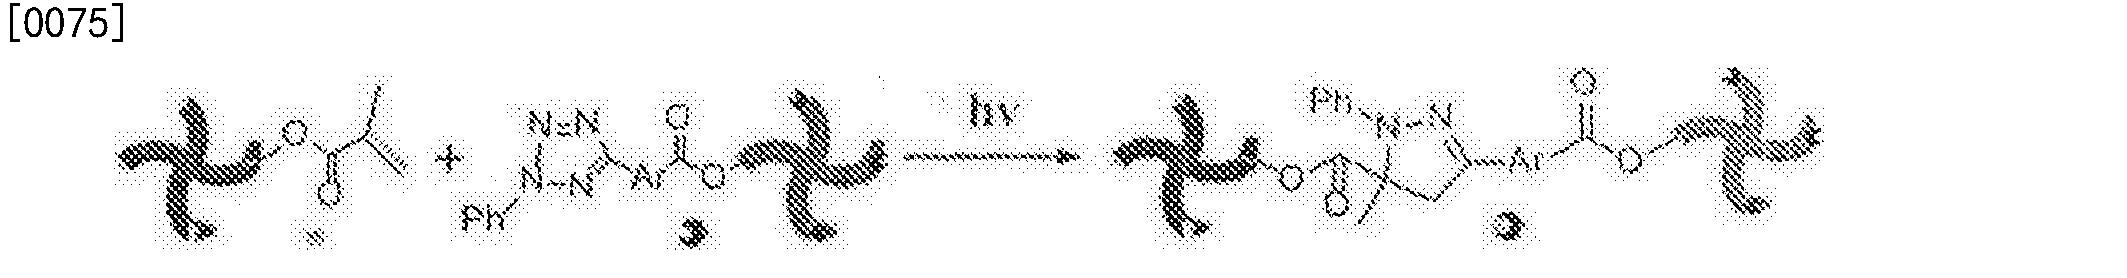 Figure CN105017538AD00071